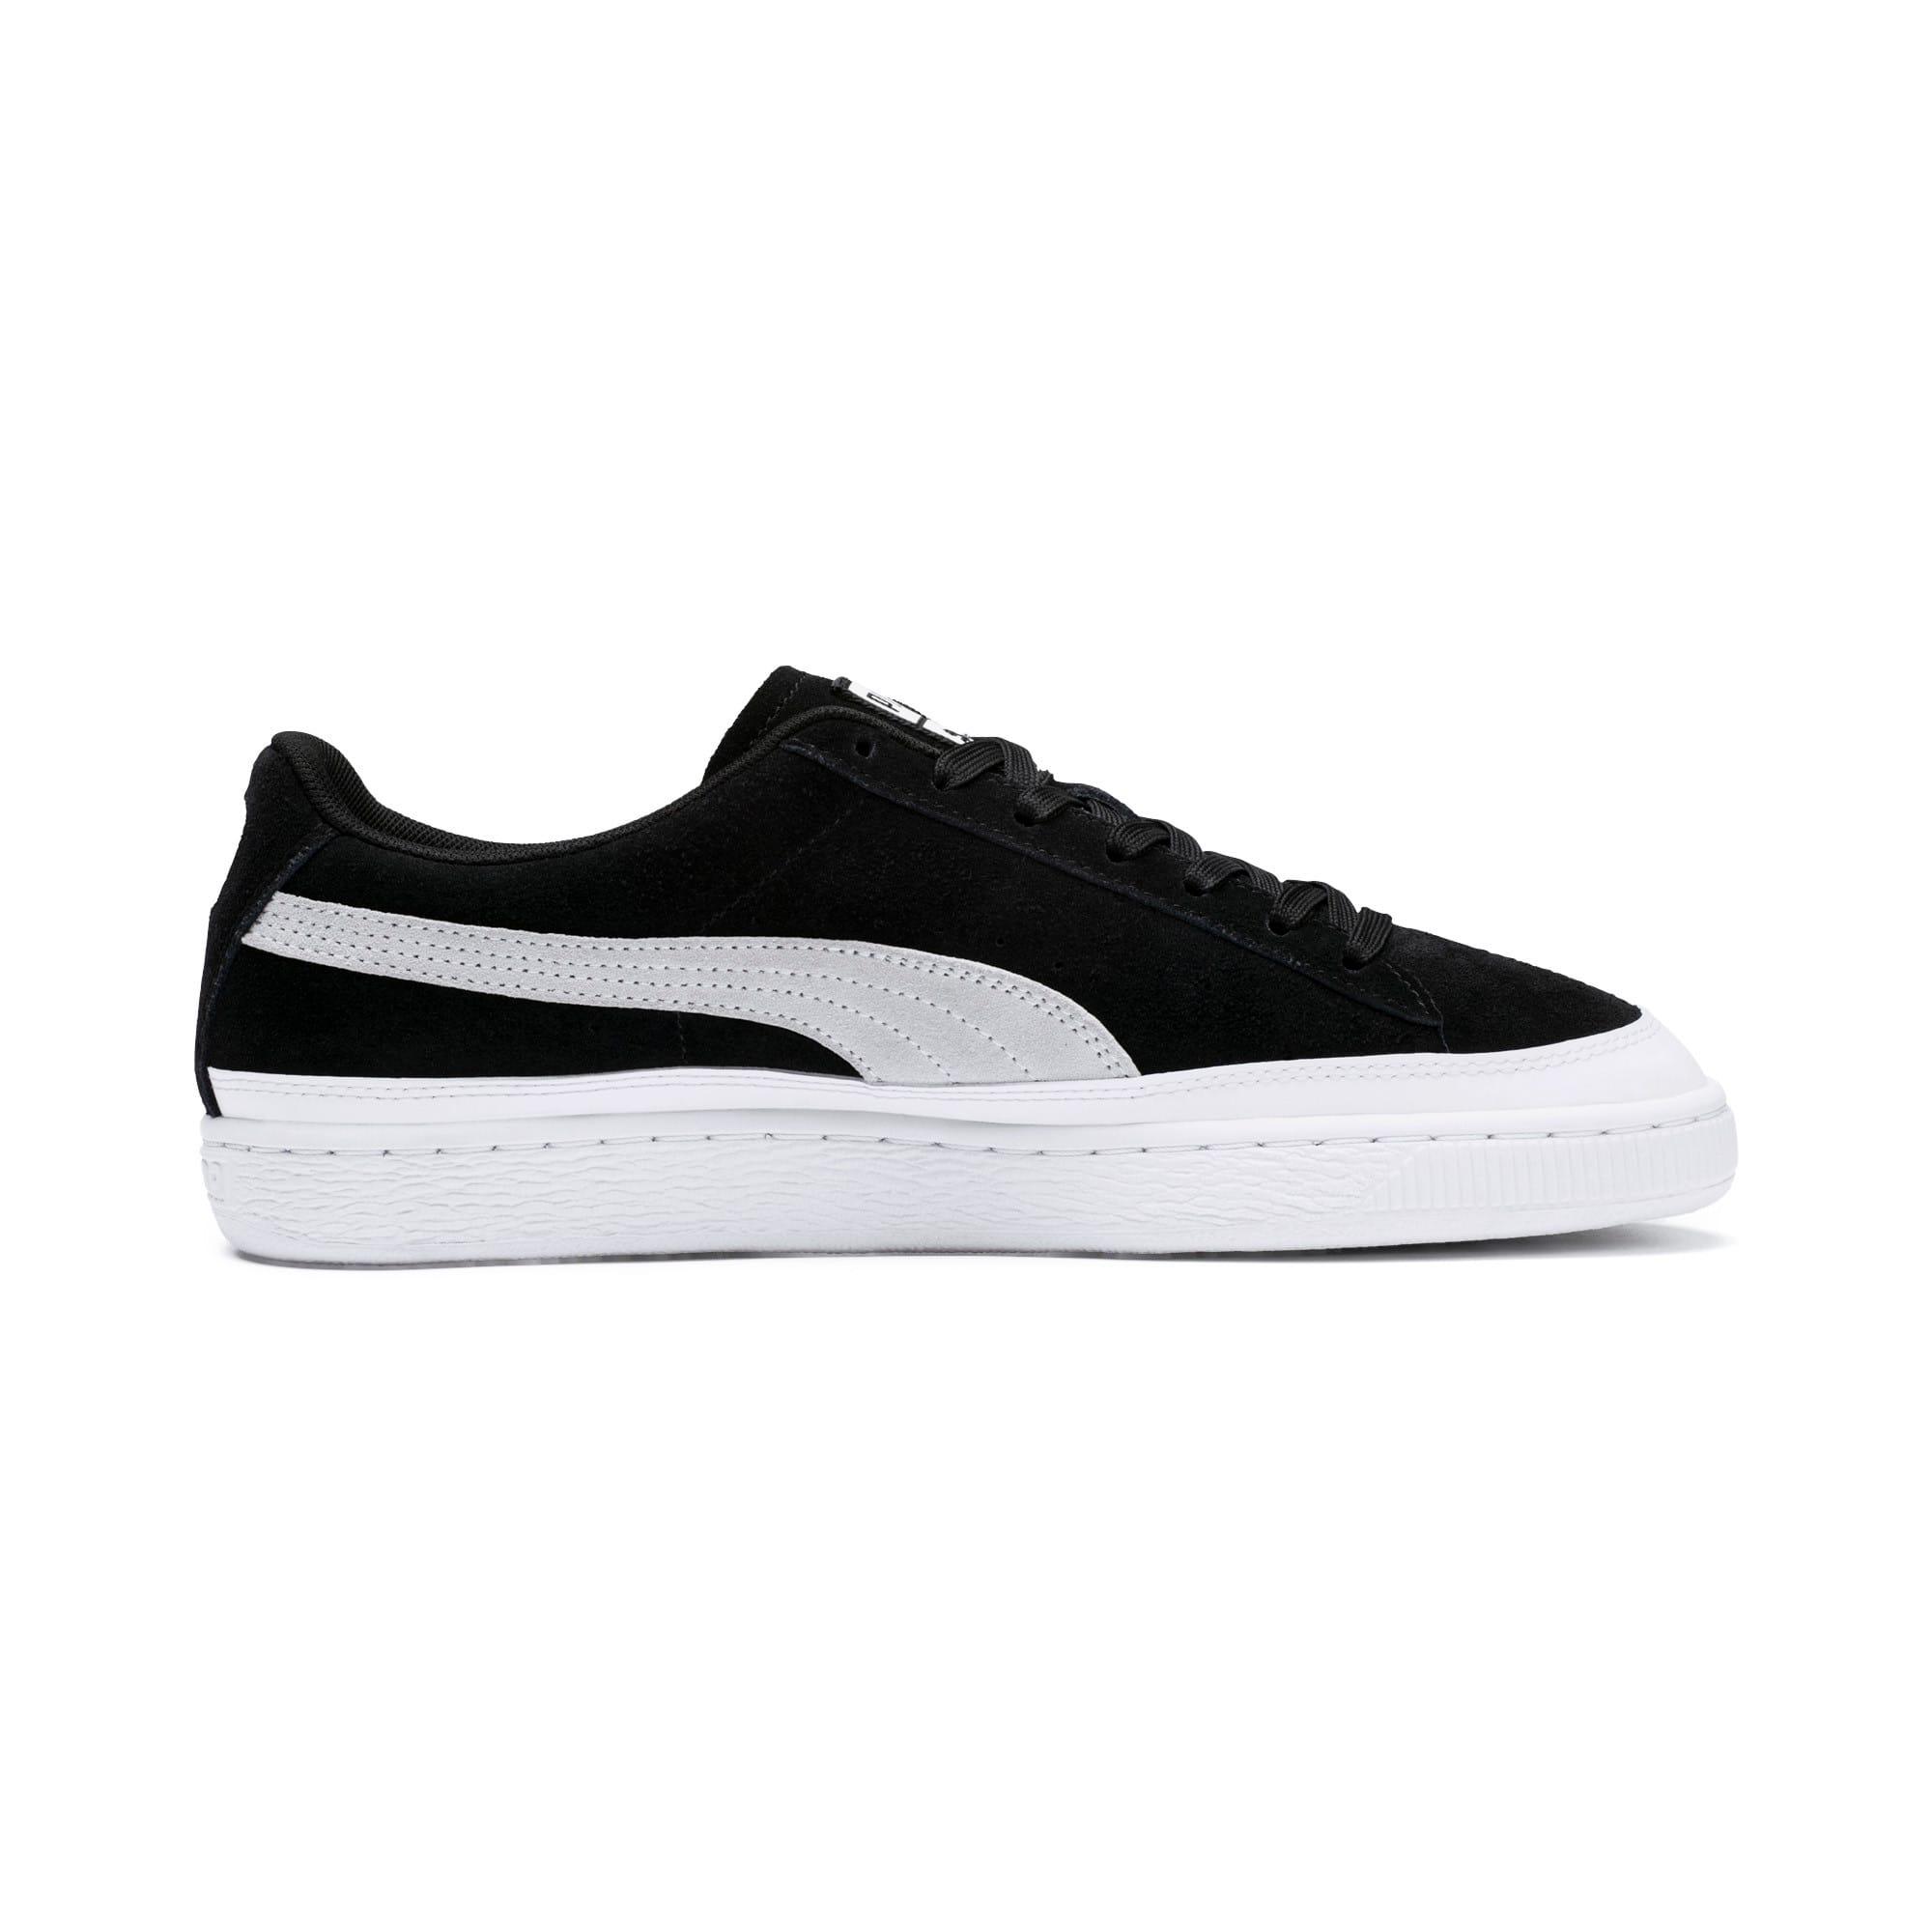 Thumbnail 5 of Suede Skate Sneakers, Puma Black-Puma White, medium